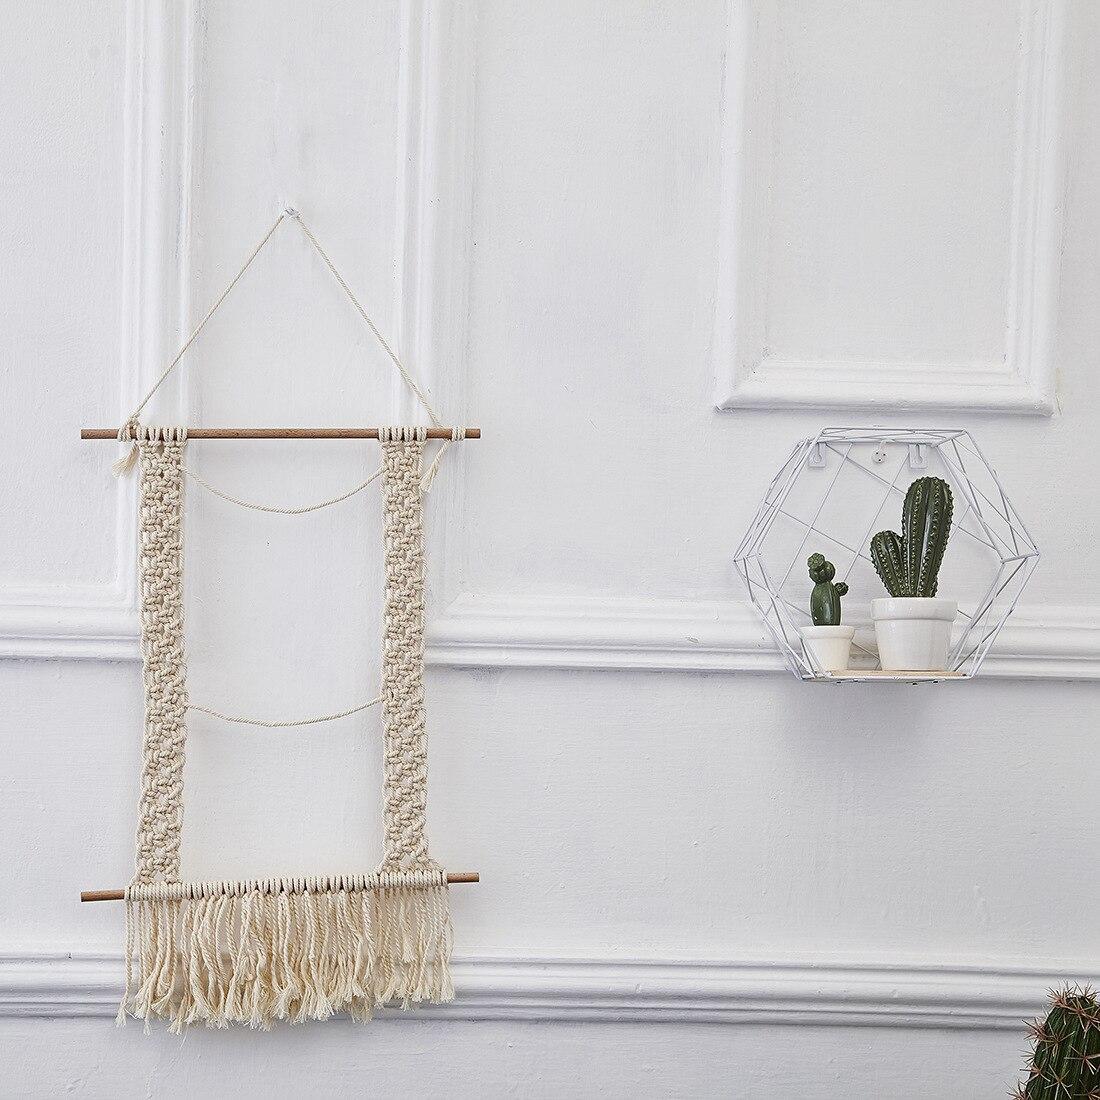 Handmade Hanging Wall Tapestry Macrame Photo Frame Boho ...